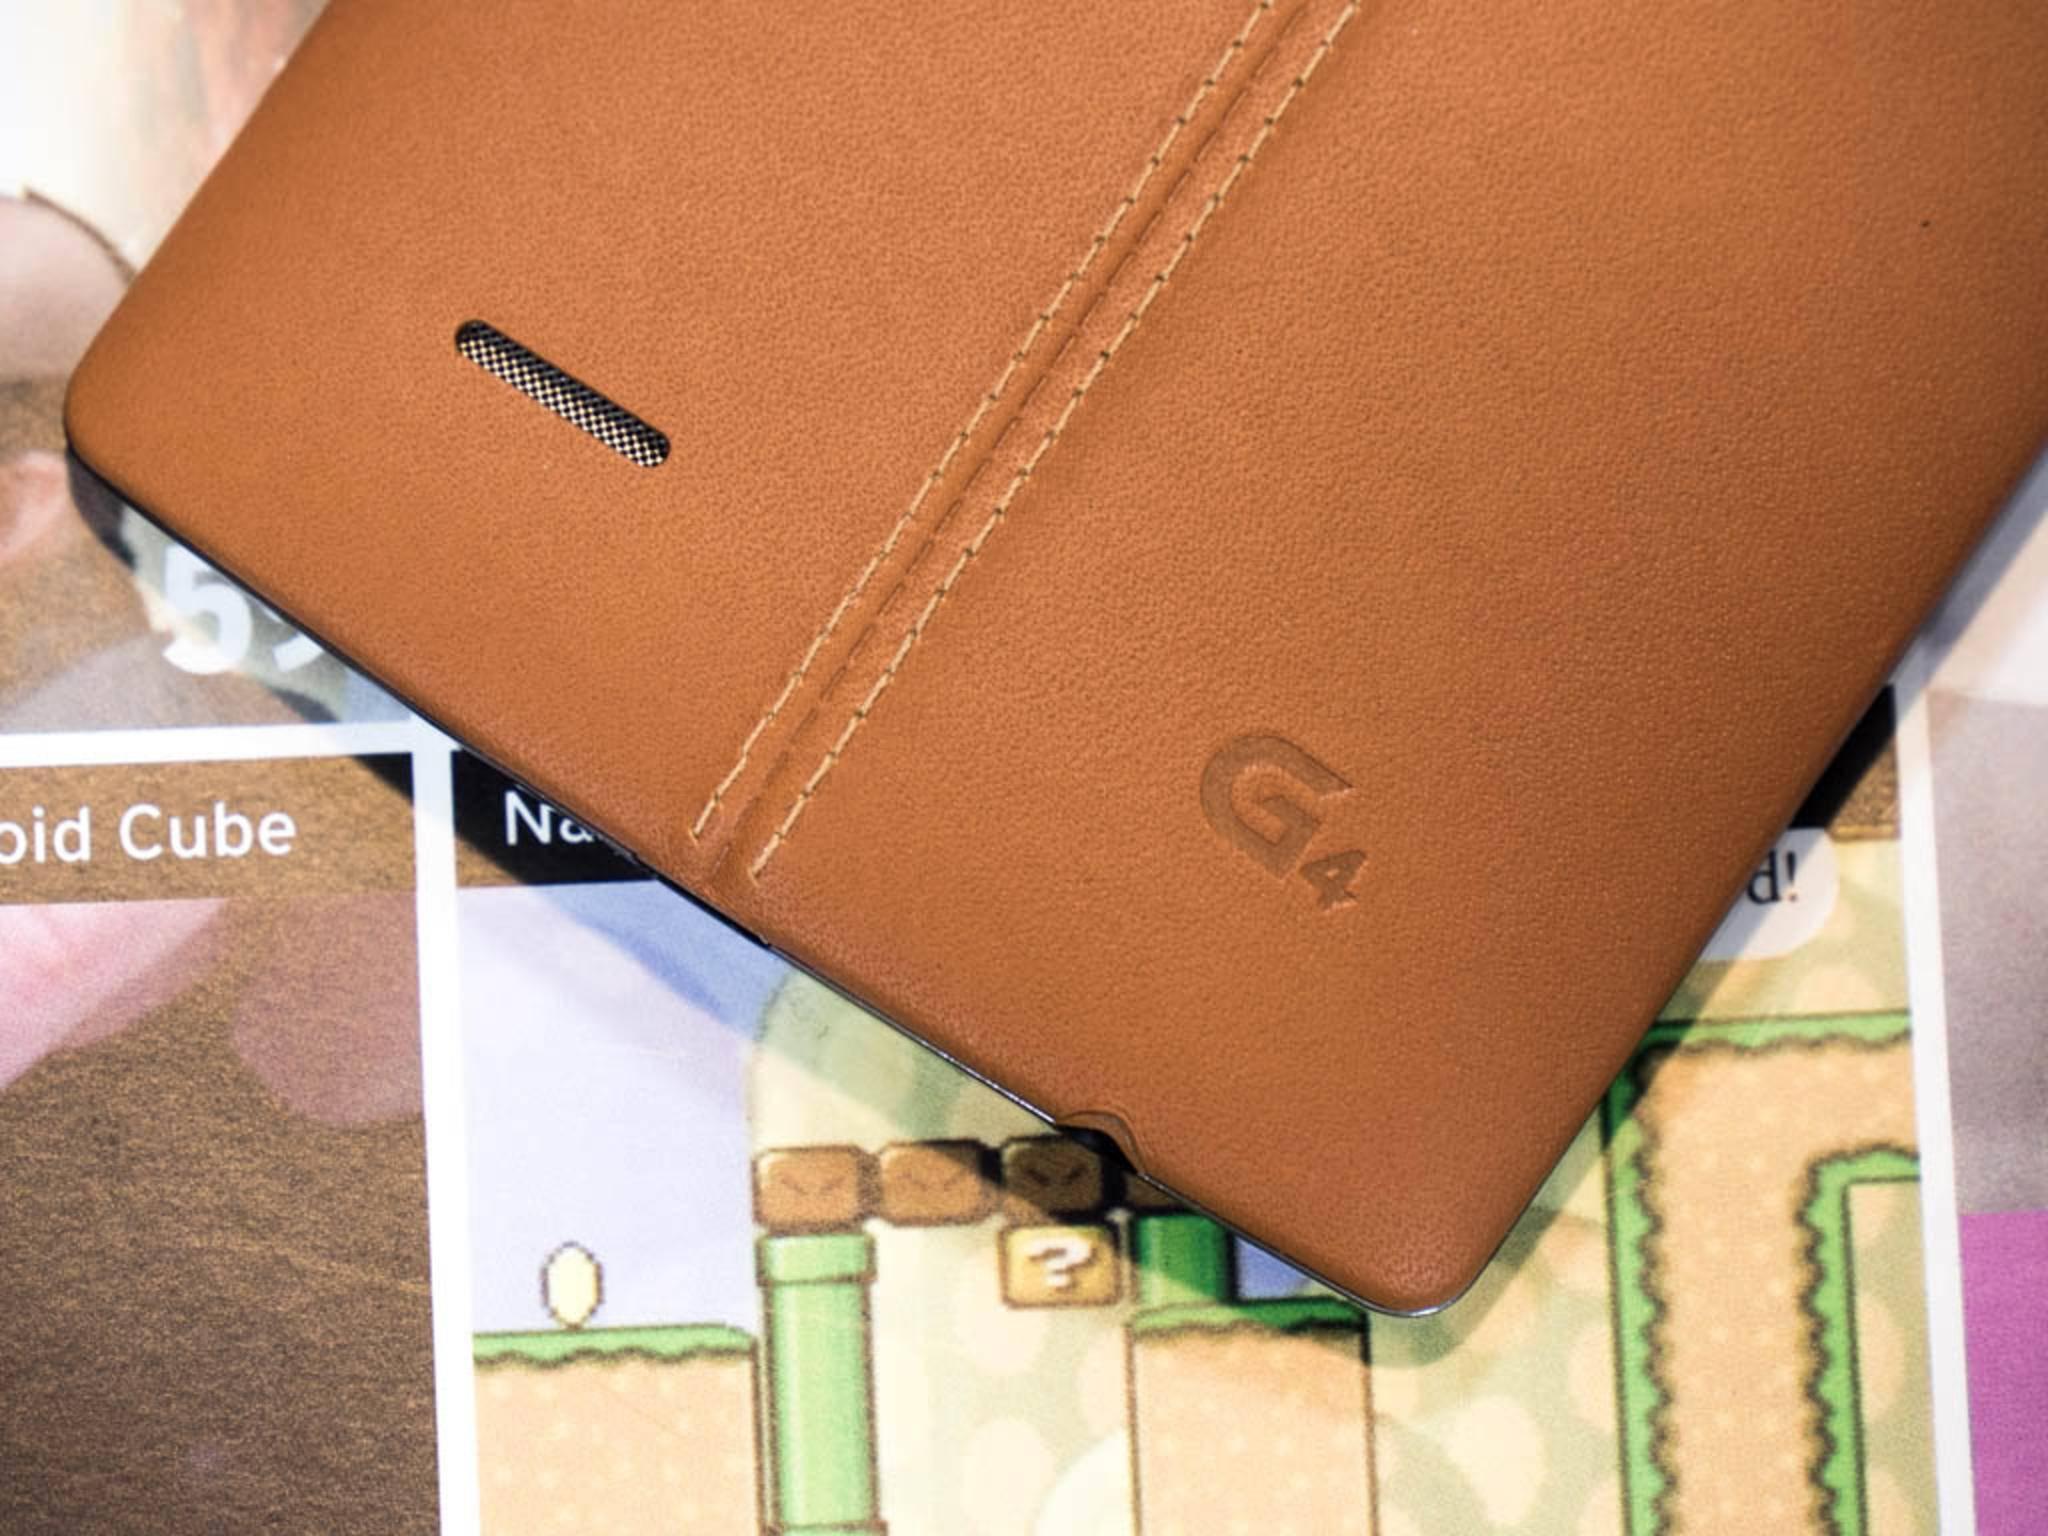 Das LG G4 bekommt nun auch in Südkorea Android 6.0 Marshmallow.